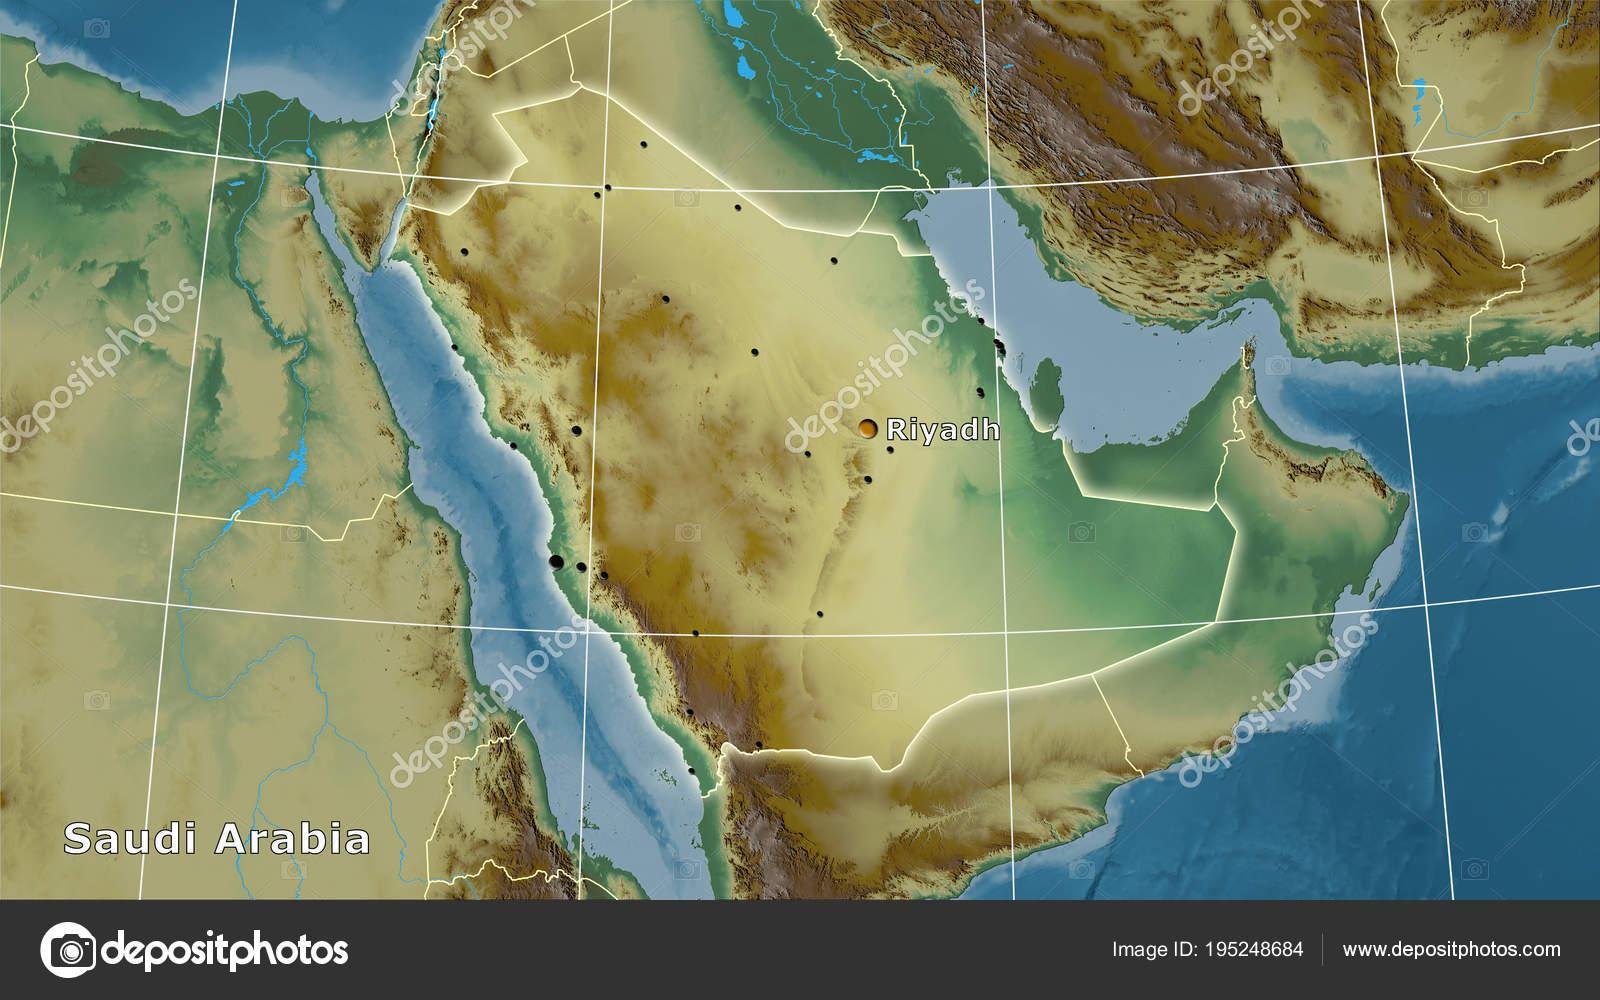 Topographic Map Of Saudi Arabia.Saudi Arabia Topographic Relief Composition Stock Photo